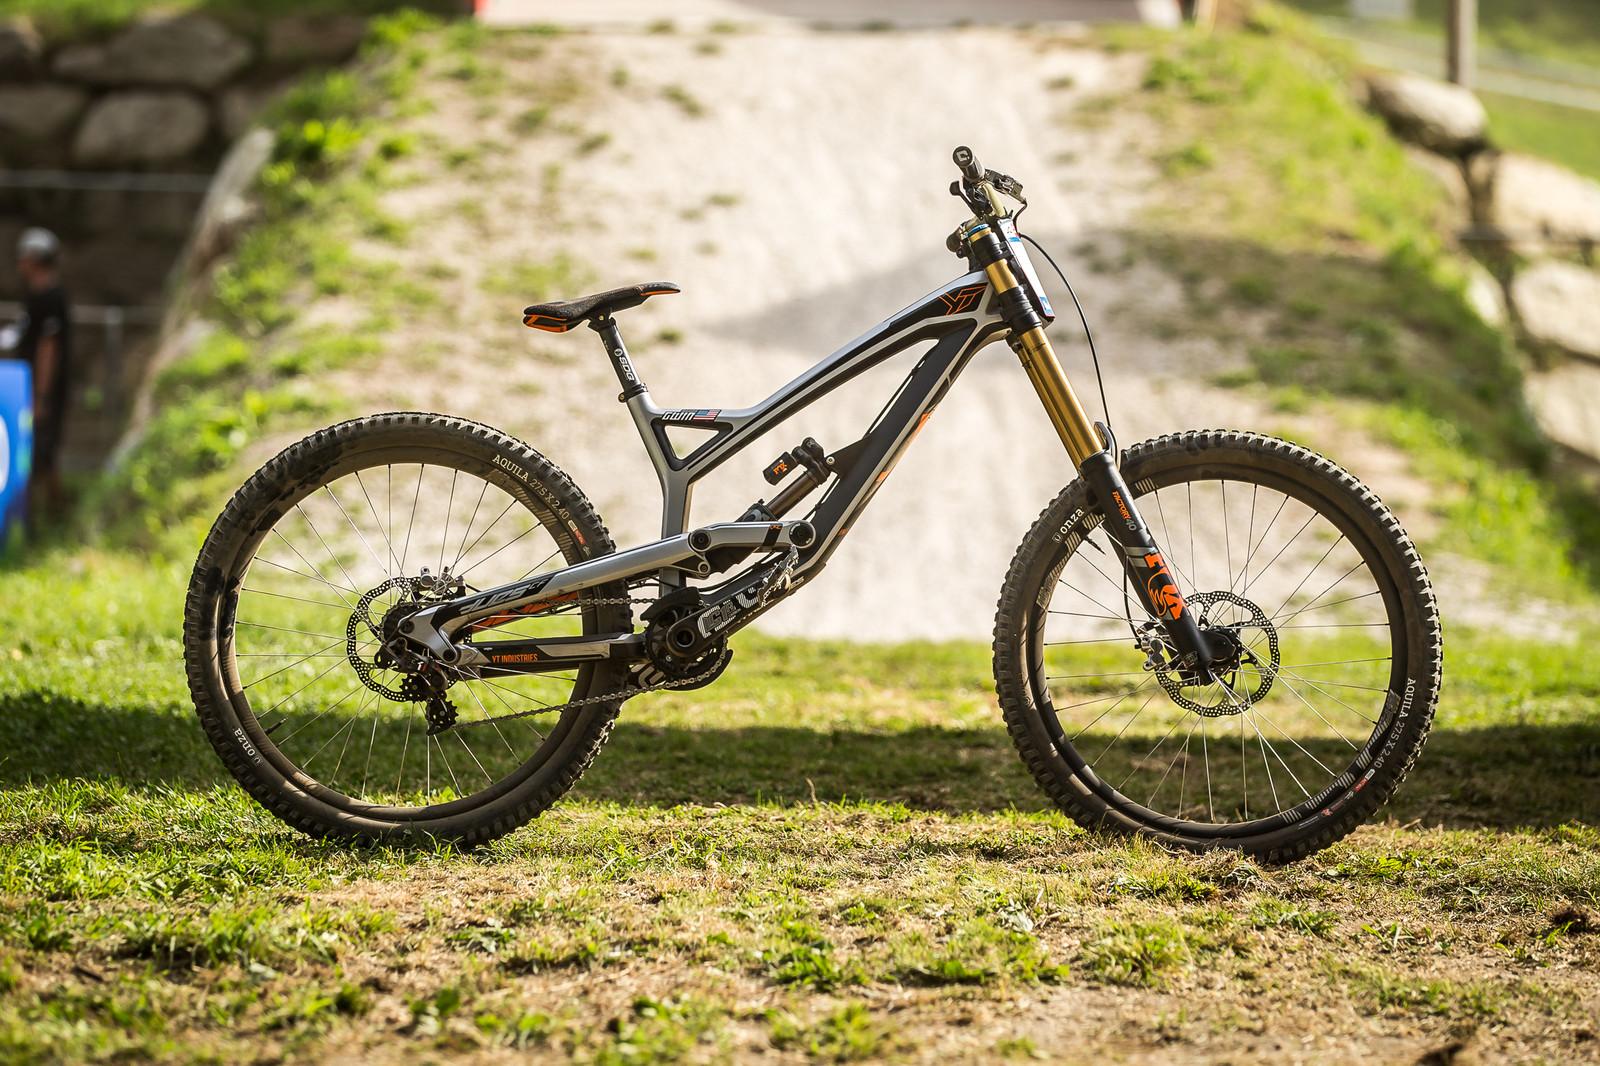 WINNING BIKE: Aaron Gwin's YT TUES - WINNING BIKE: Aaron Gwin's YT TUES - Mountain Biking Pictures - Vital MTB